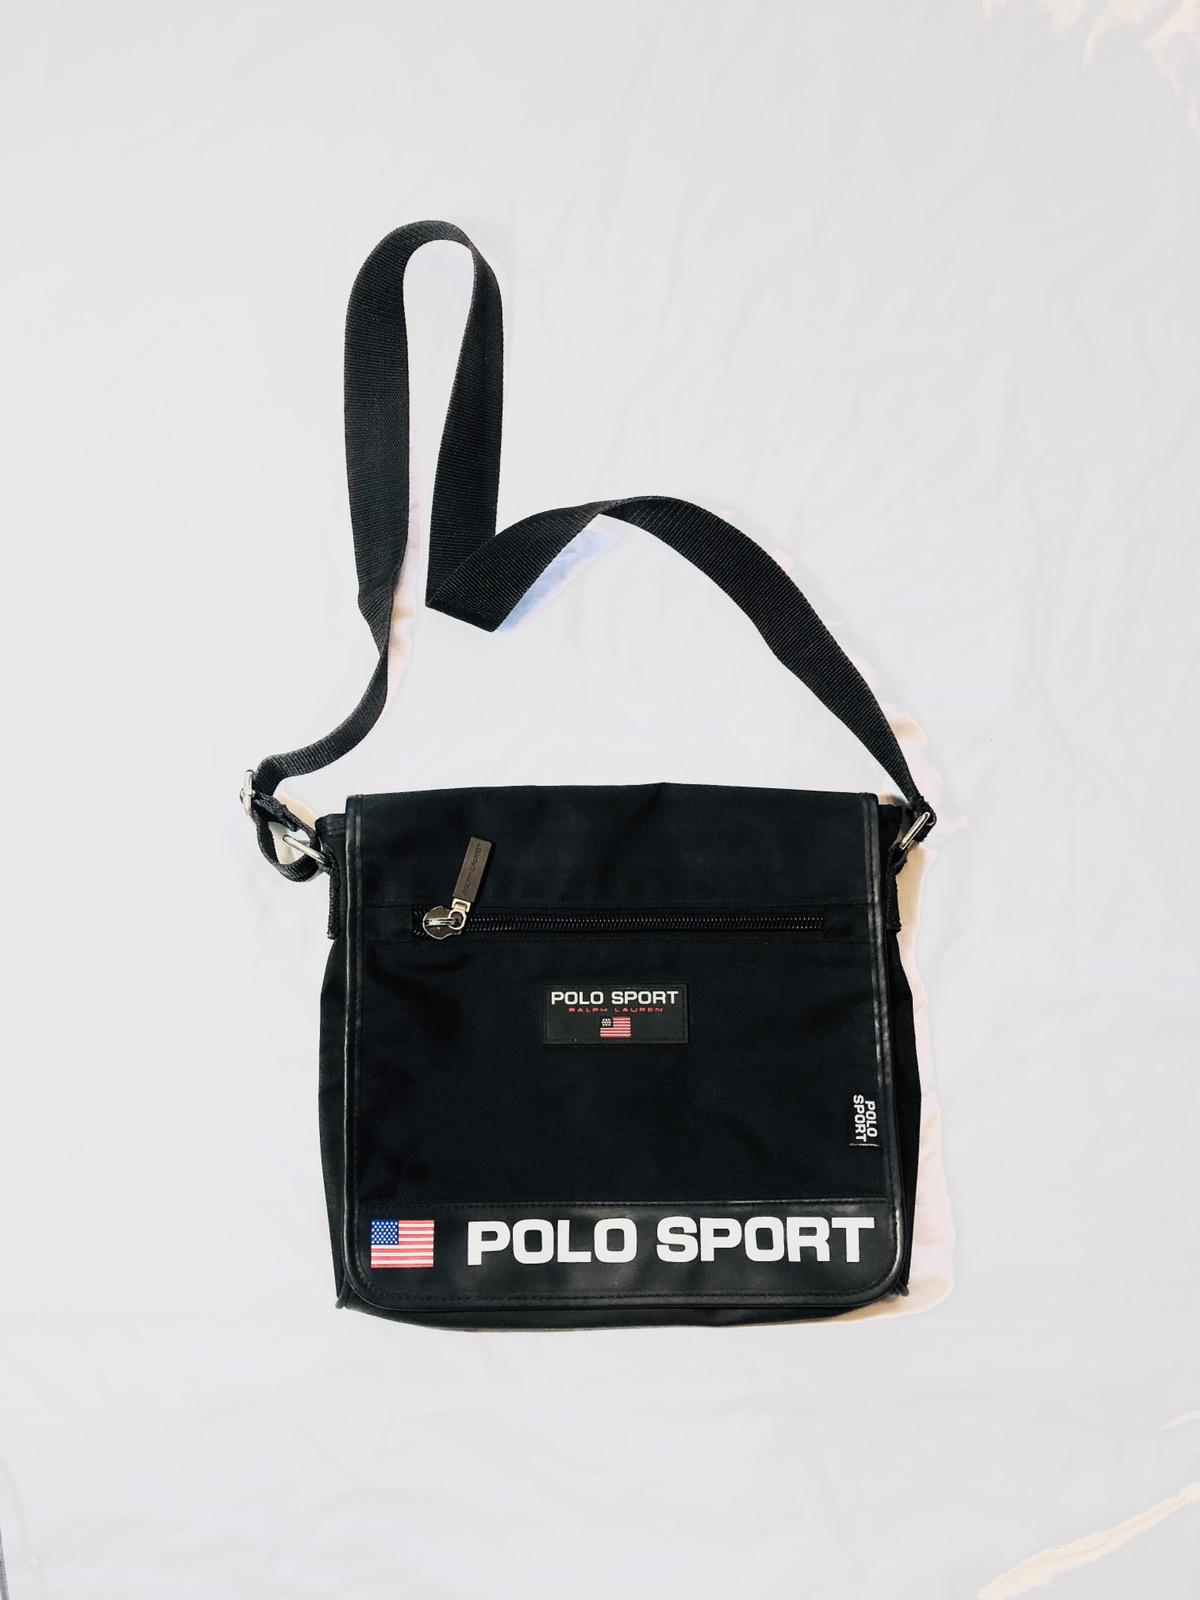 b8bcc873a9 Ralph Lauren Polo Sport Side Bag| Perú Gustoso